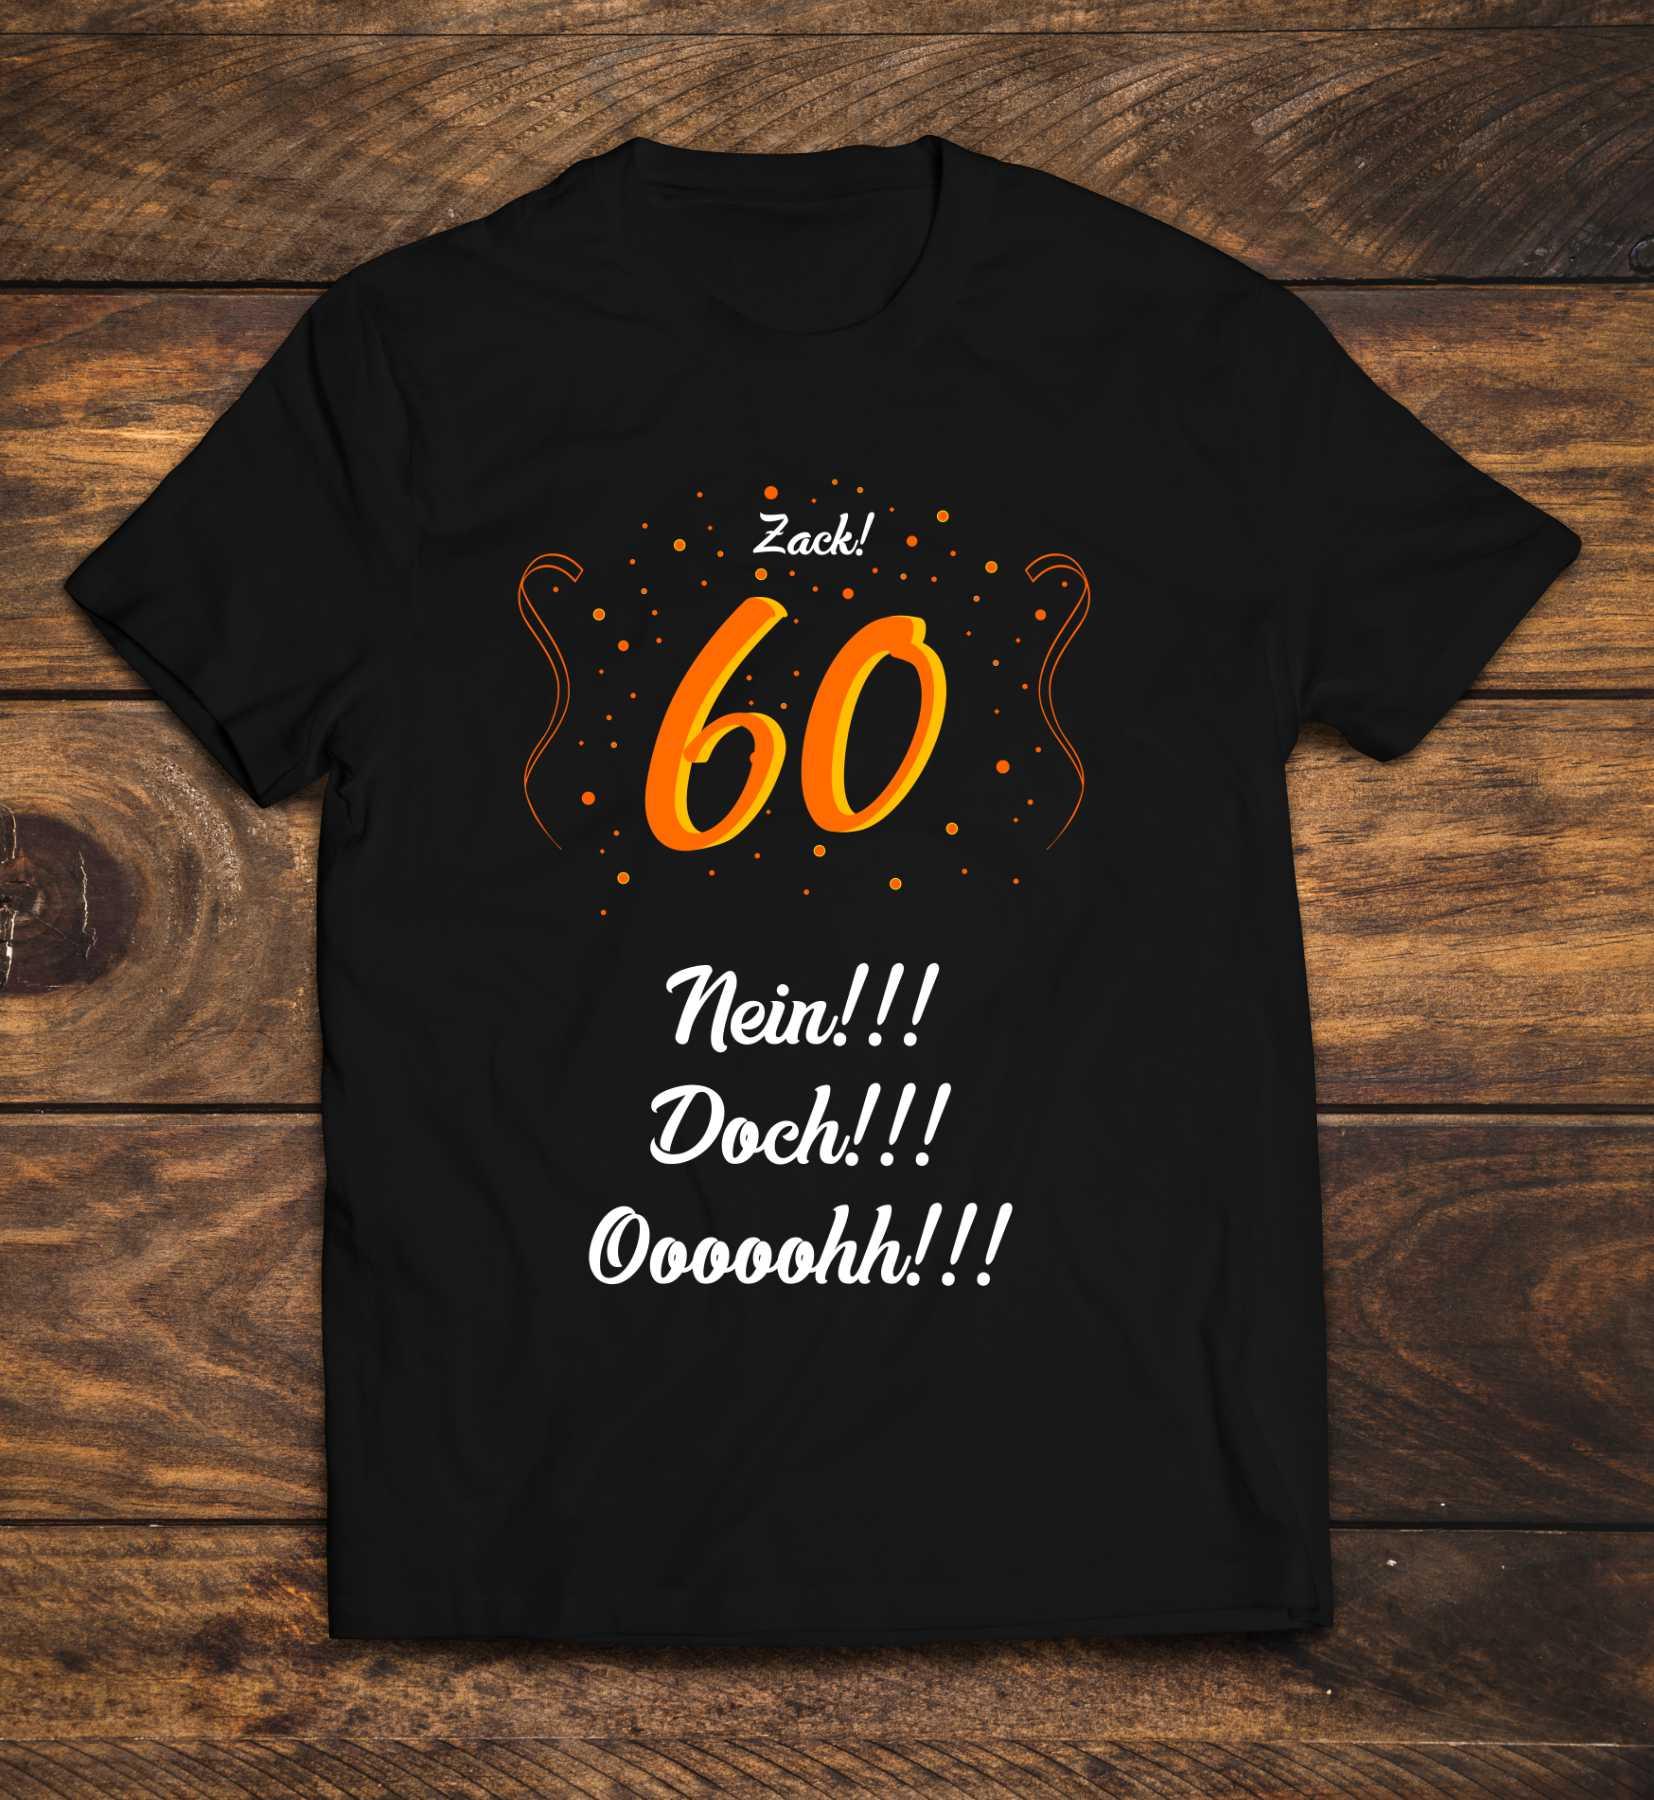 60-Geburtstag-T-Shirt